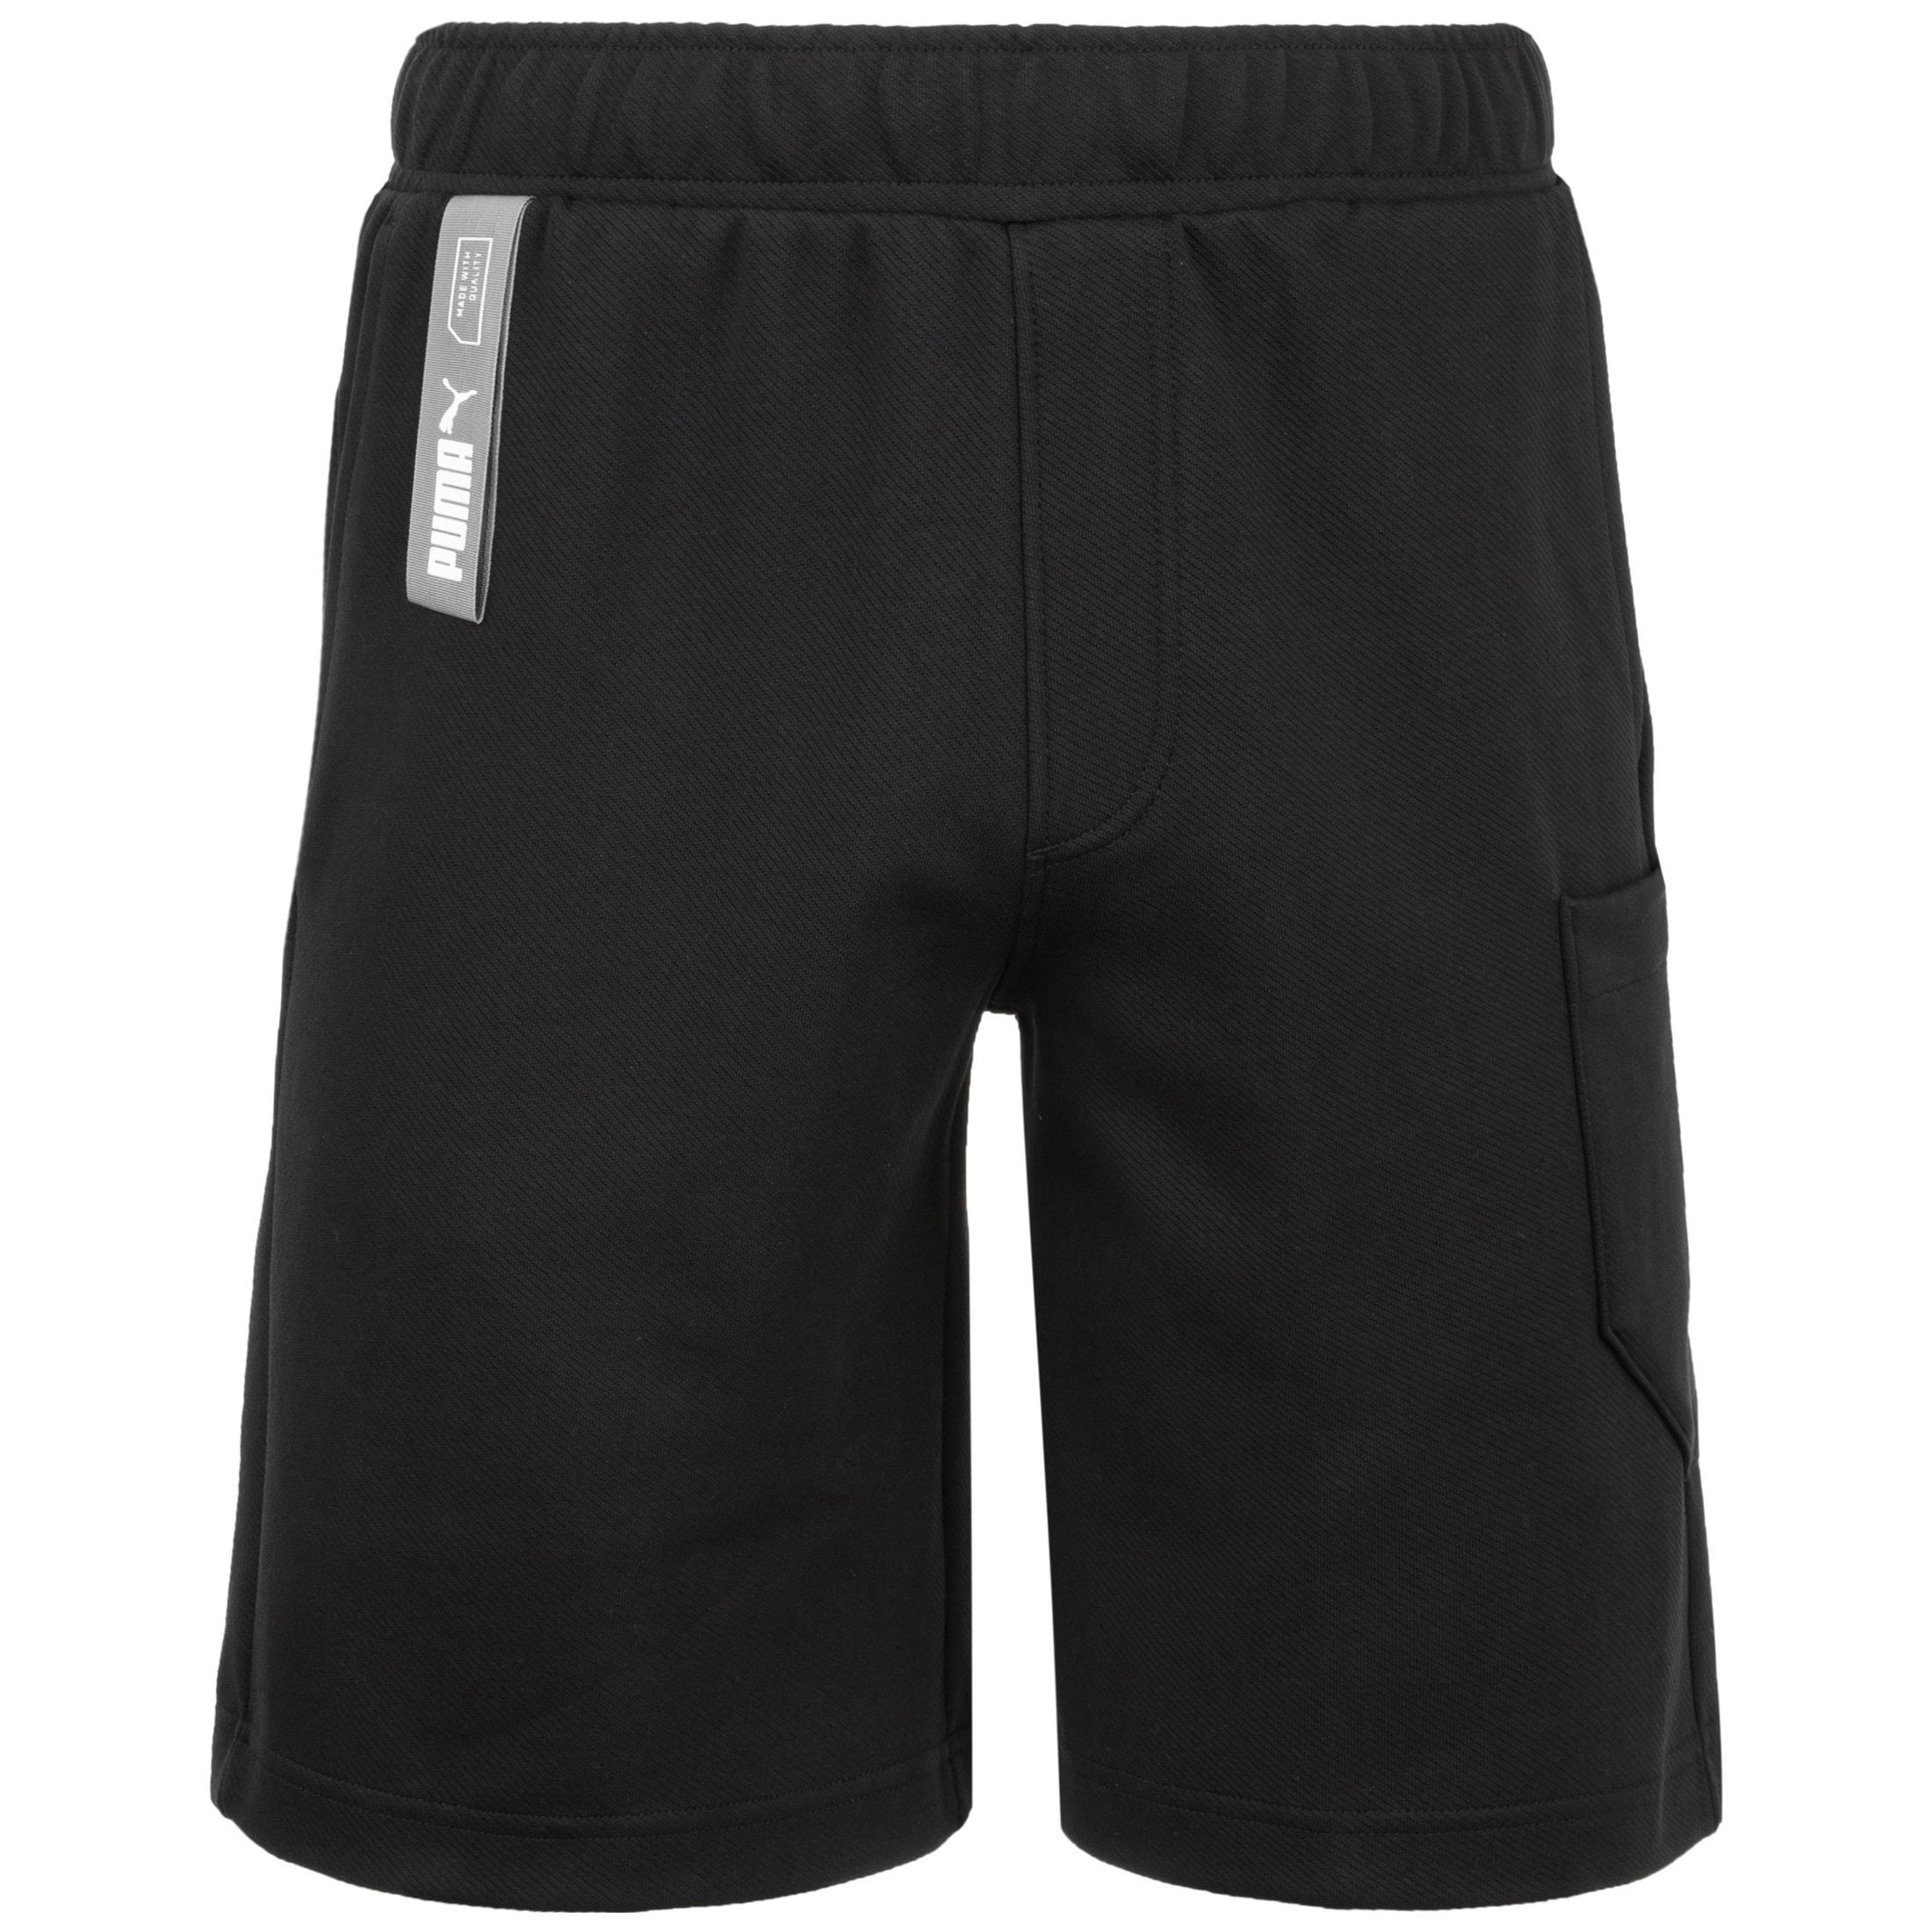 PUMA Trainingsshorts Nu-tility | Bekleidung > Shorts & Bermudas > Shorts | Puma